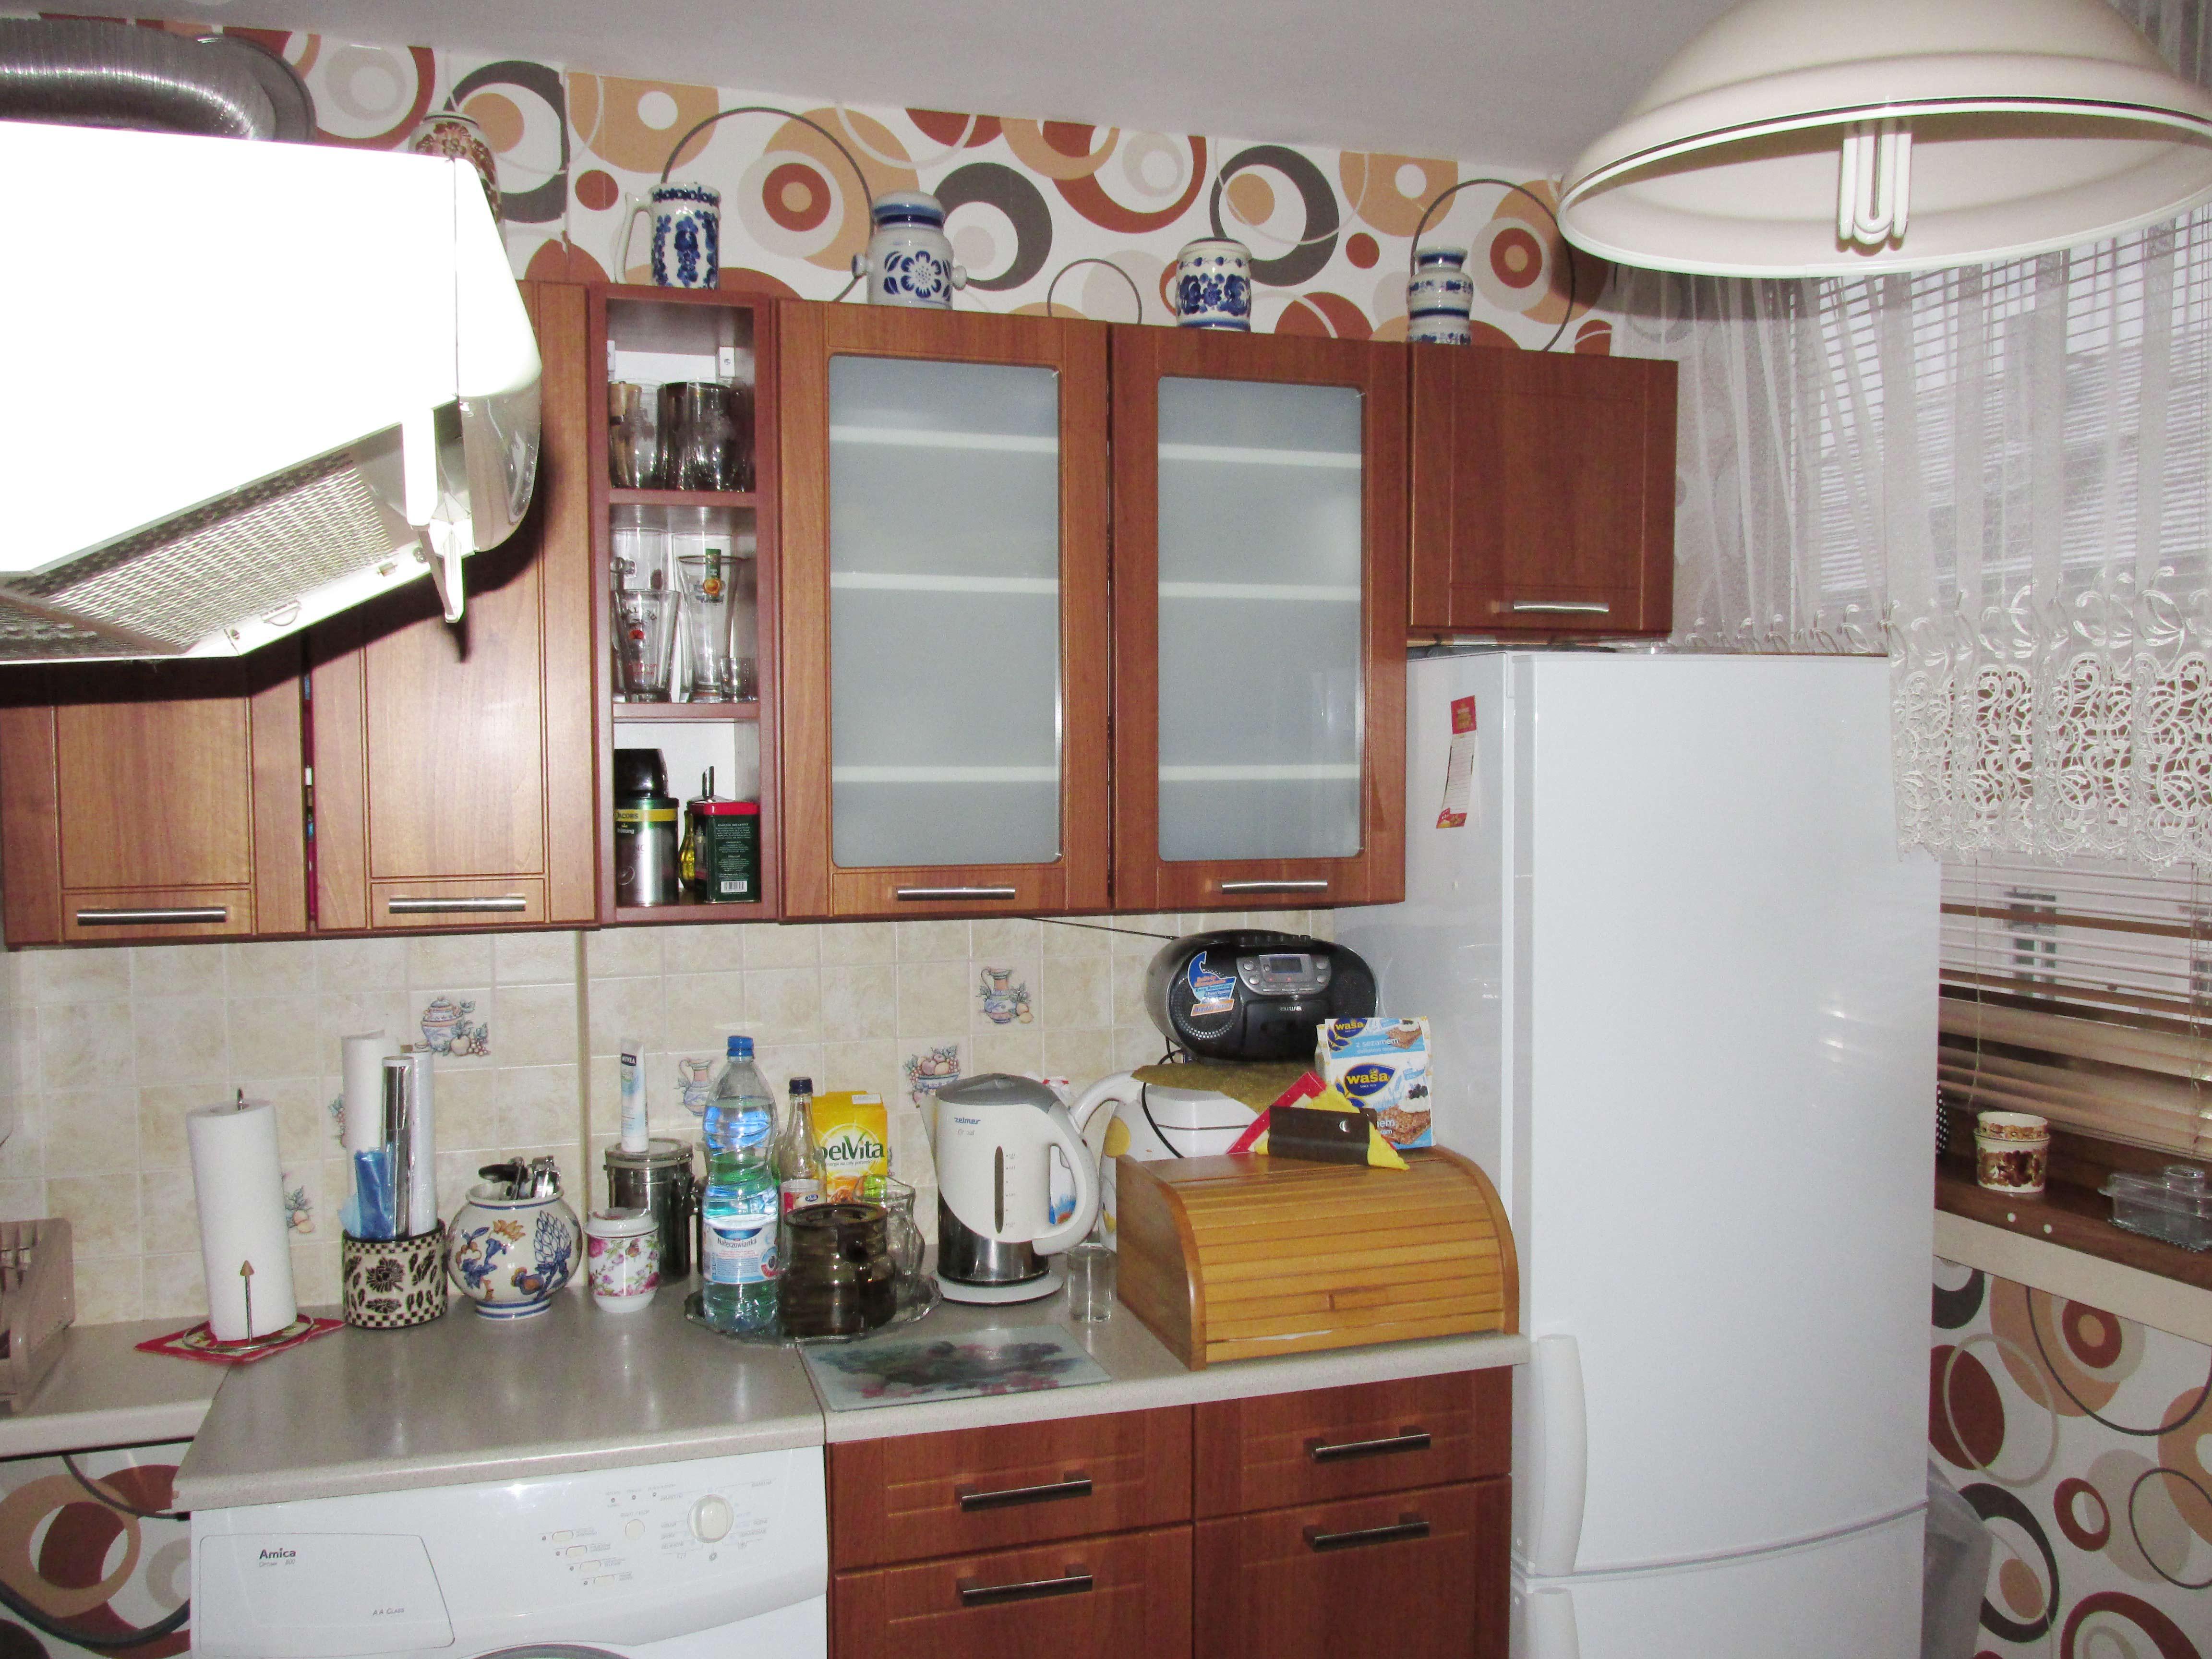 Remont kuchni koszt  plan remontu kuchni w bloku